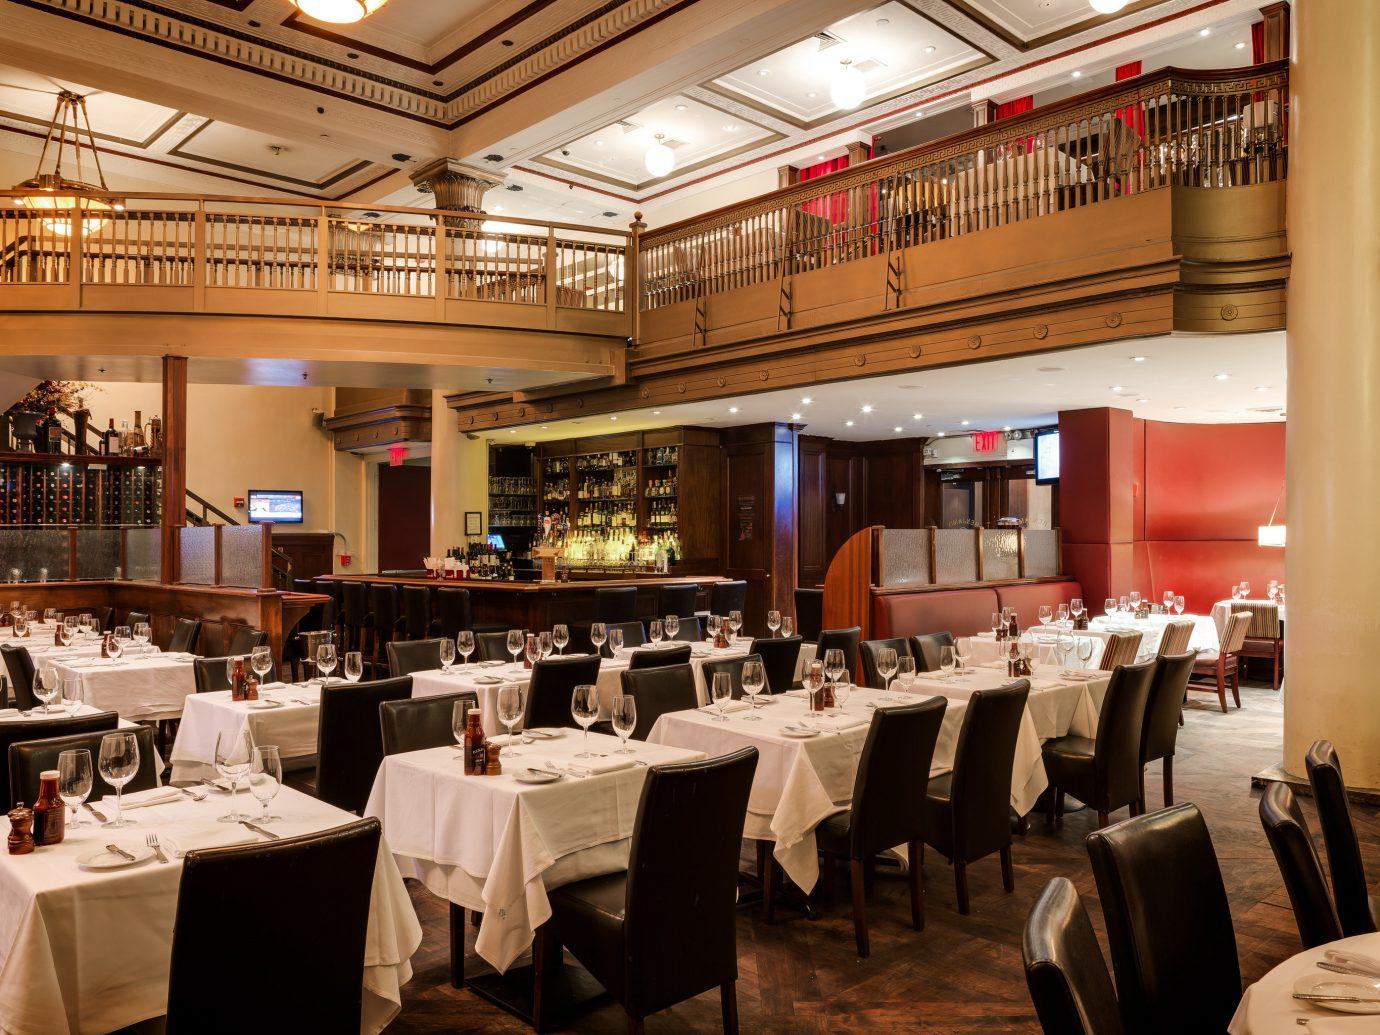 Food + Drink indoor table function hall meal restaurant interior design ballroom several